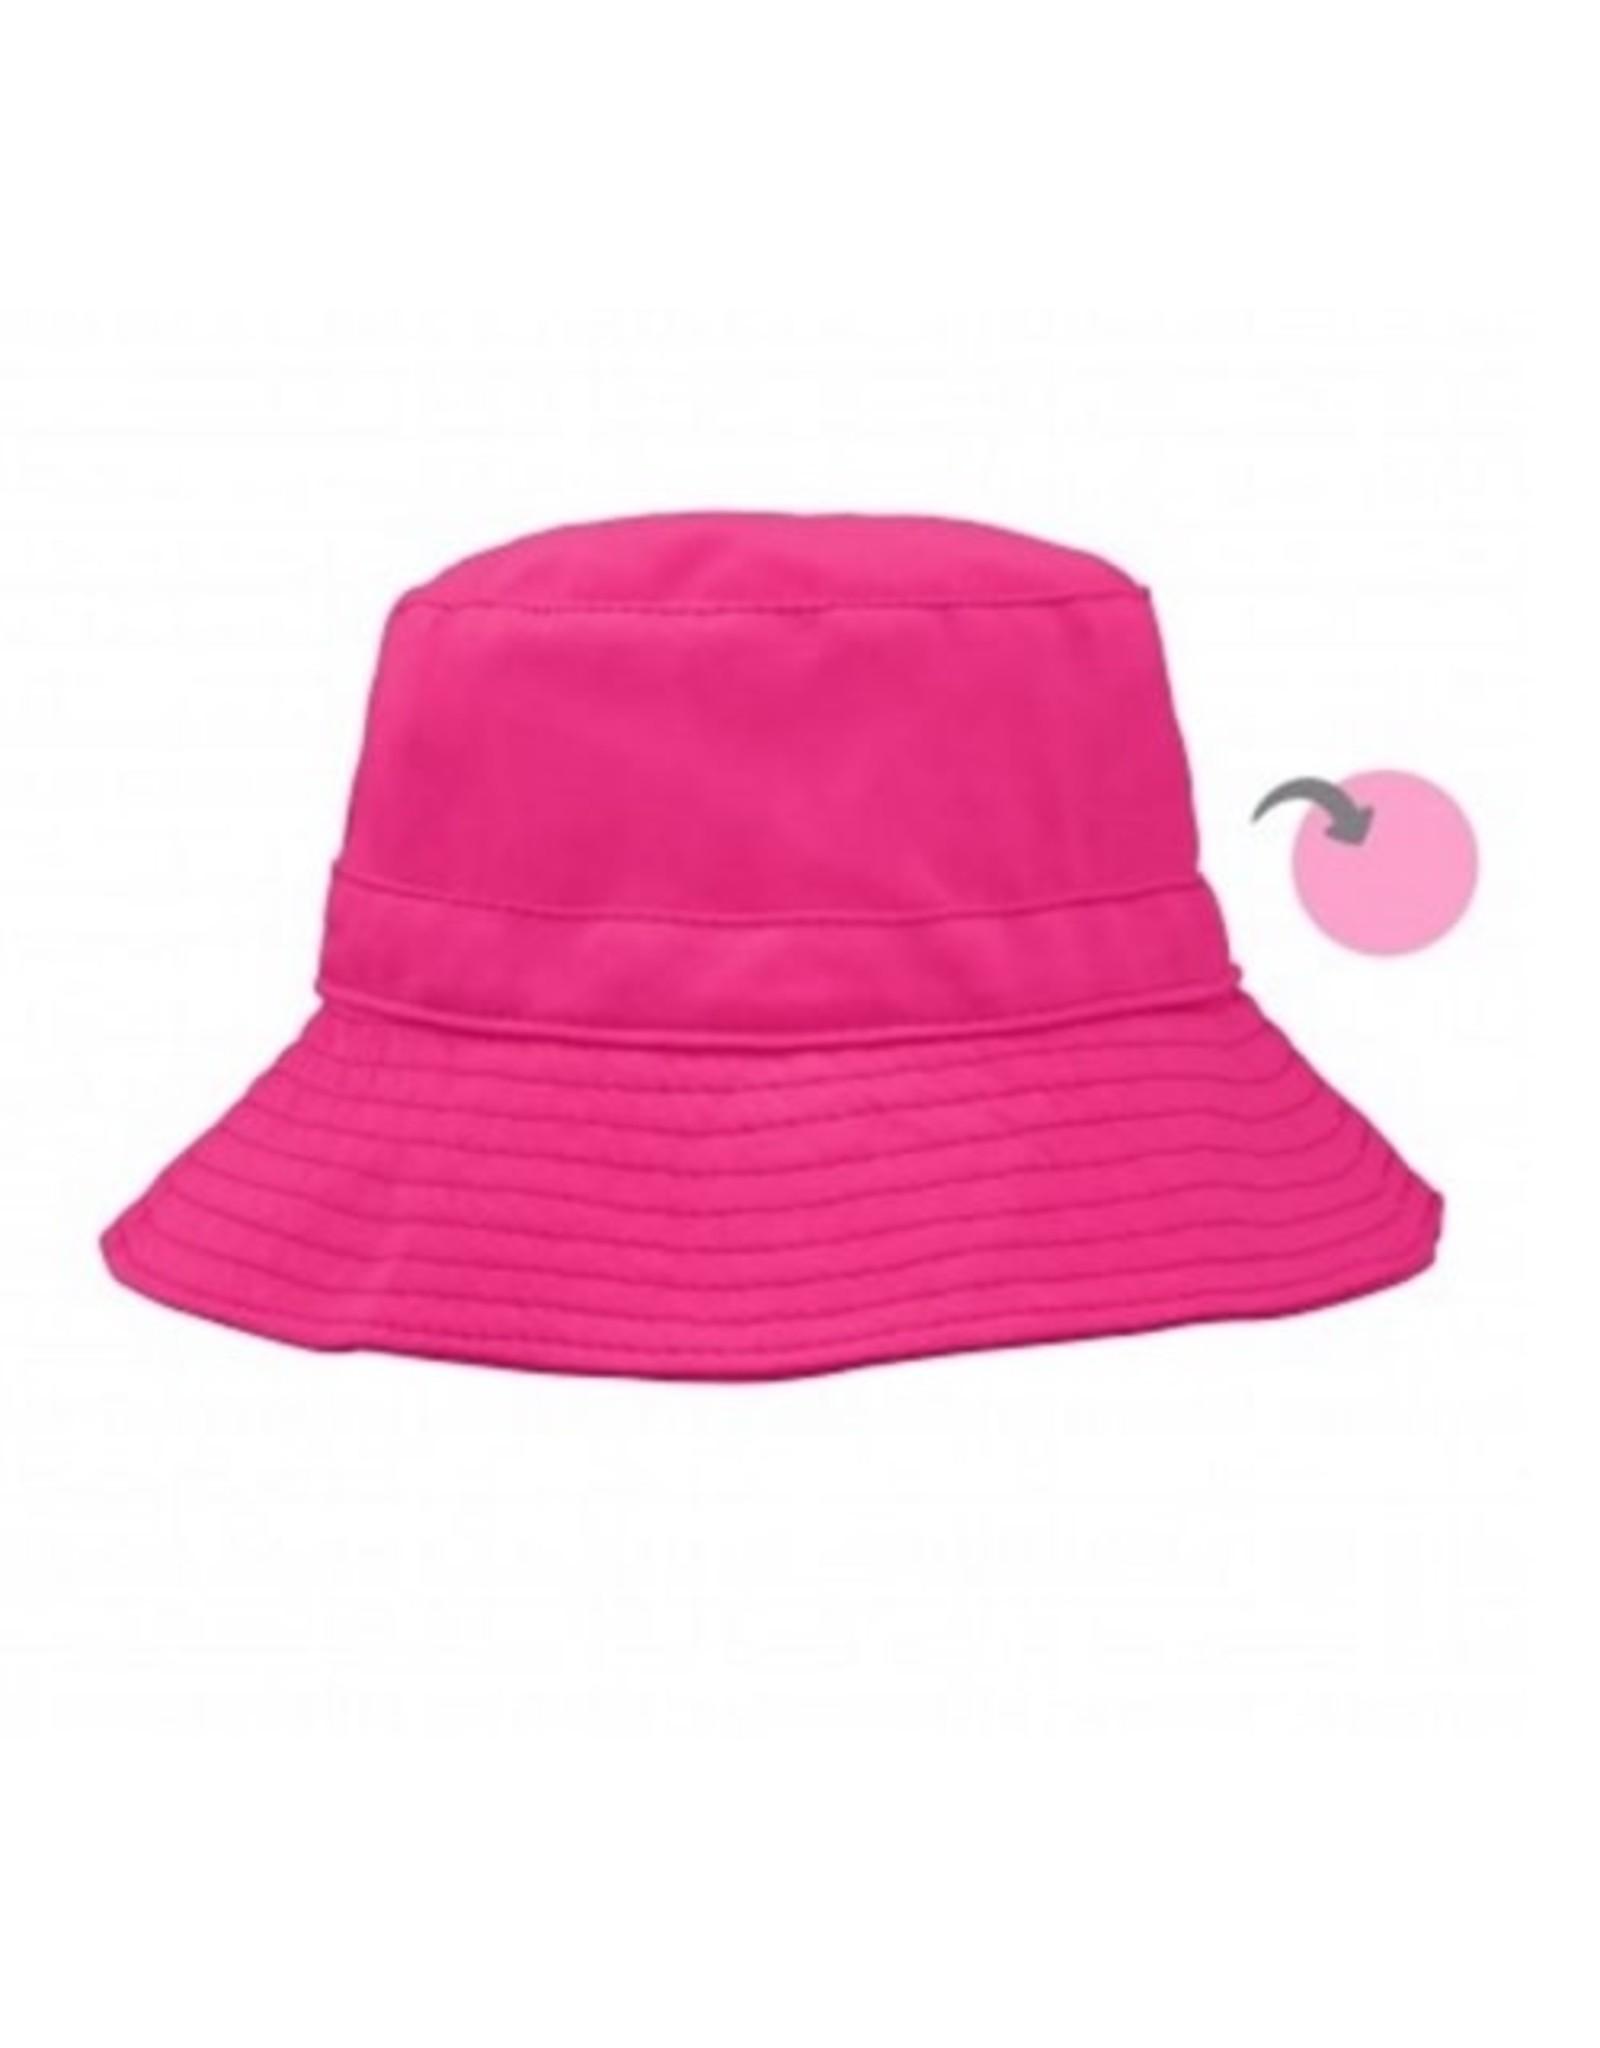 iPlay Reversible Bucket Hat, Pink, 0-6 months